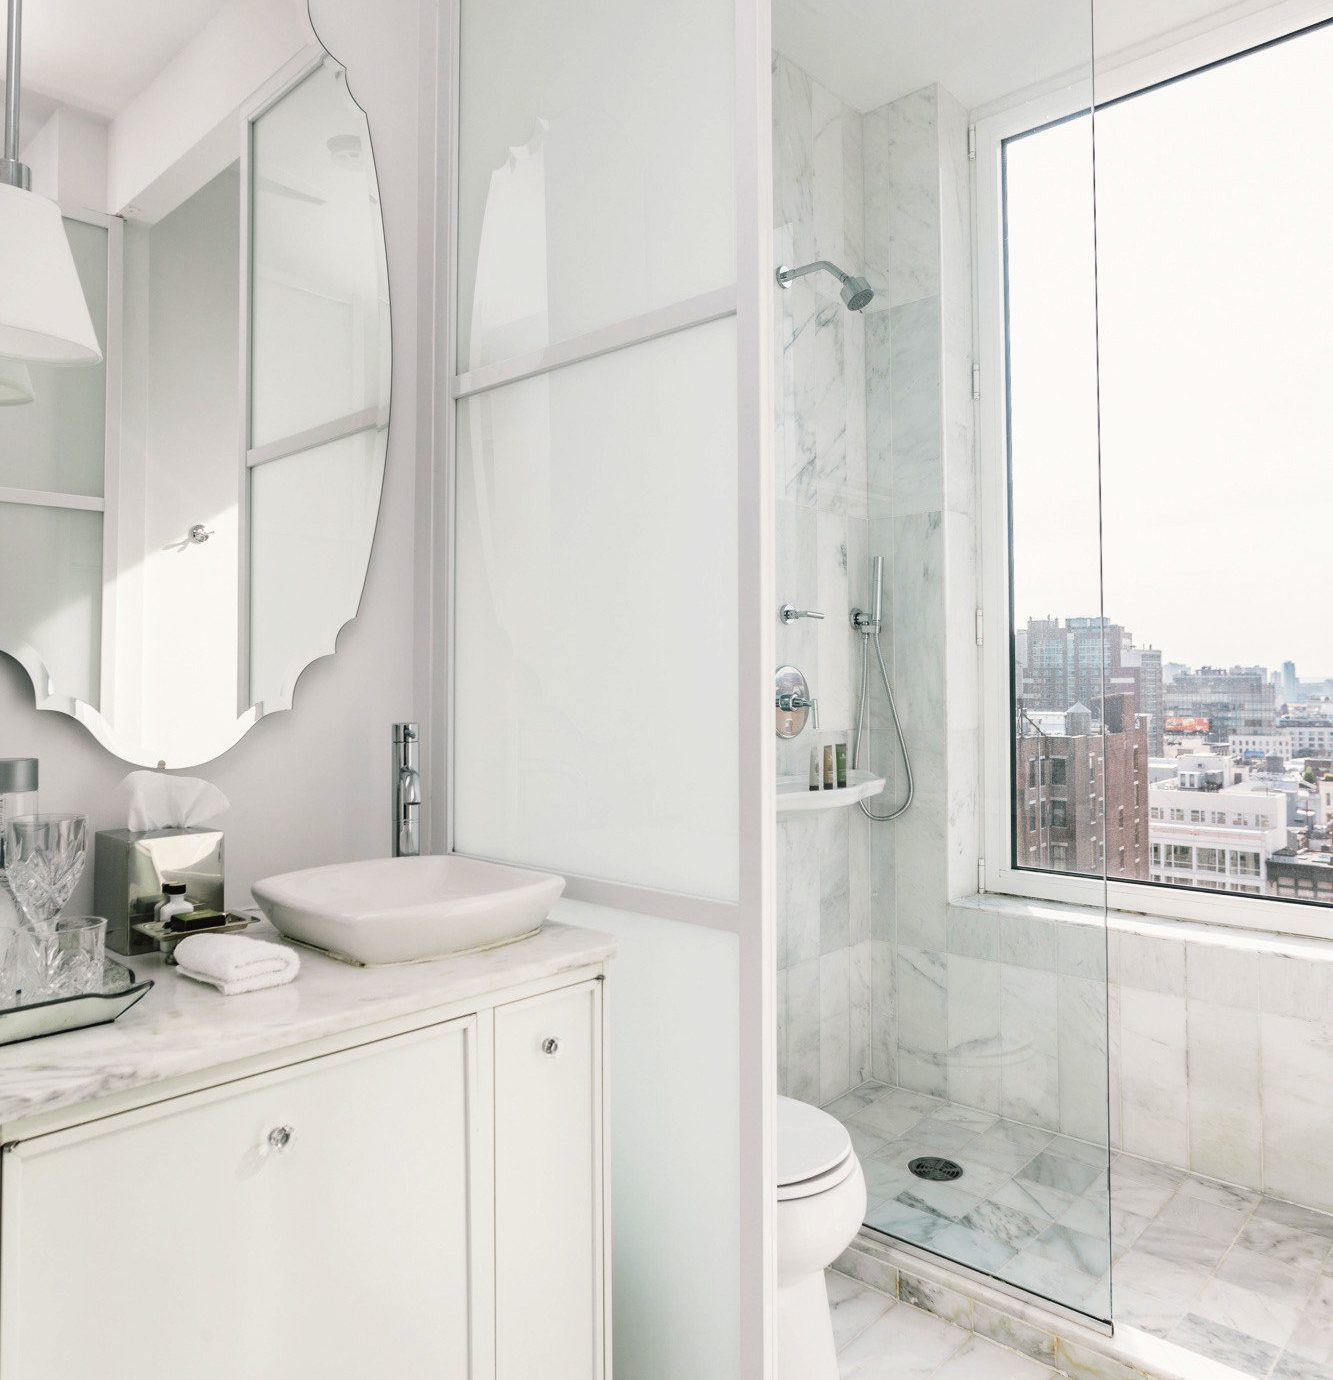 Bath Boutique City Modern bathroom property white bidet home plumbing fixture bathtub toilet